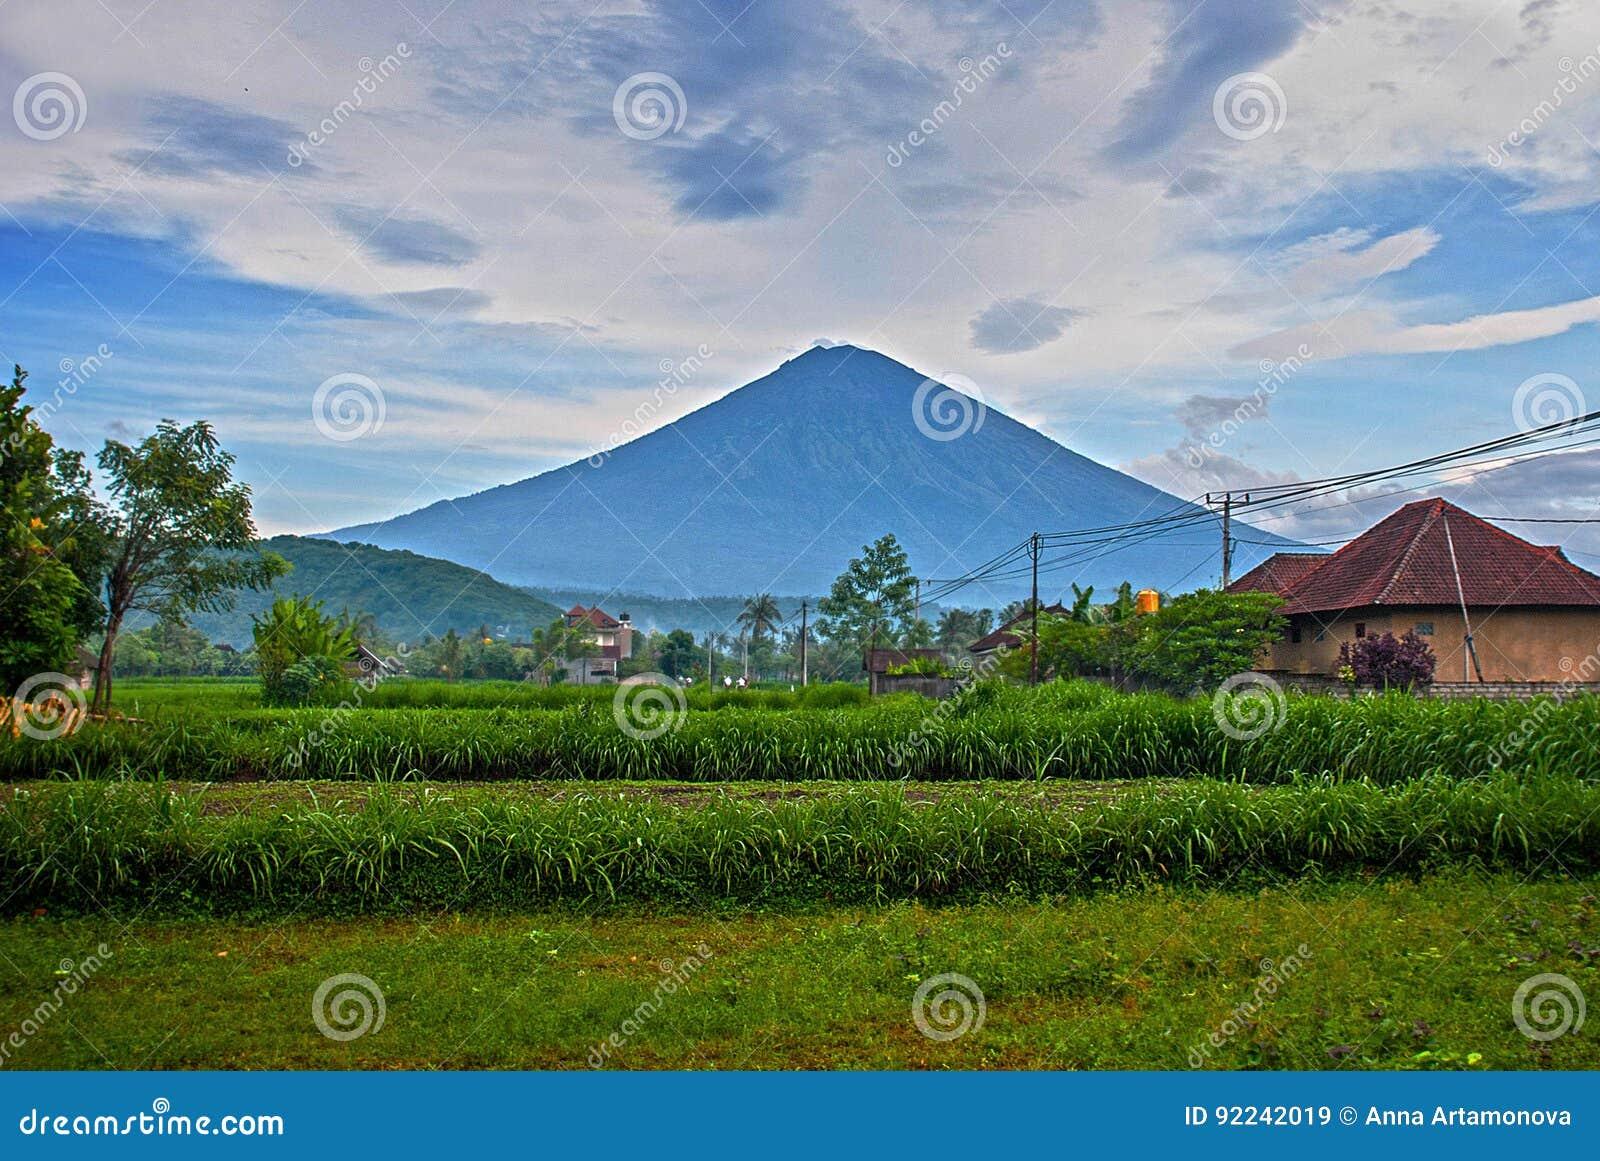 Asian Mountains - Route Descriptions - Gunung Agung, Bali trekking ...